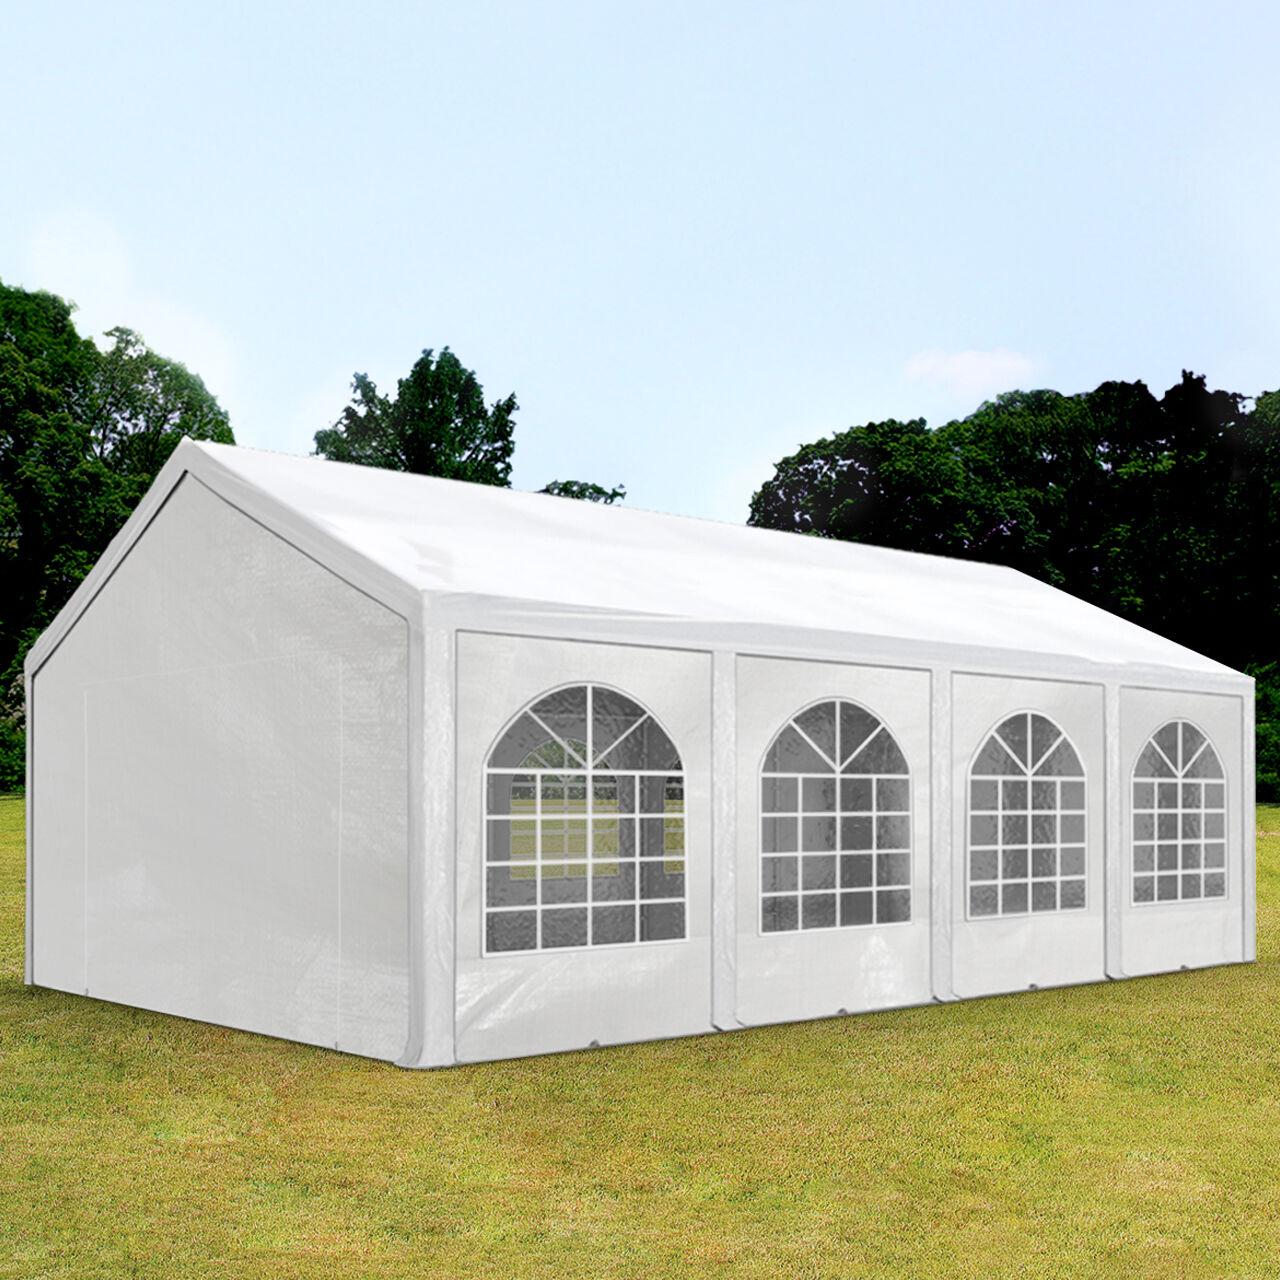 Profizelt24 Partyzelt 4x8m PE 240g/m² weiß wasserdicht Gartenzelt, Festzelt, Pavillon